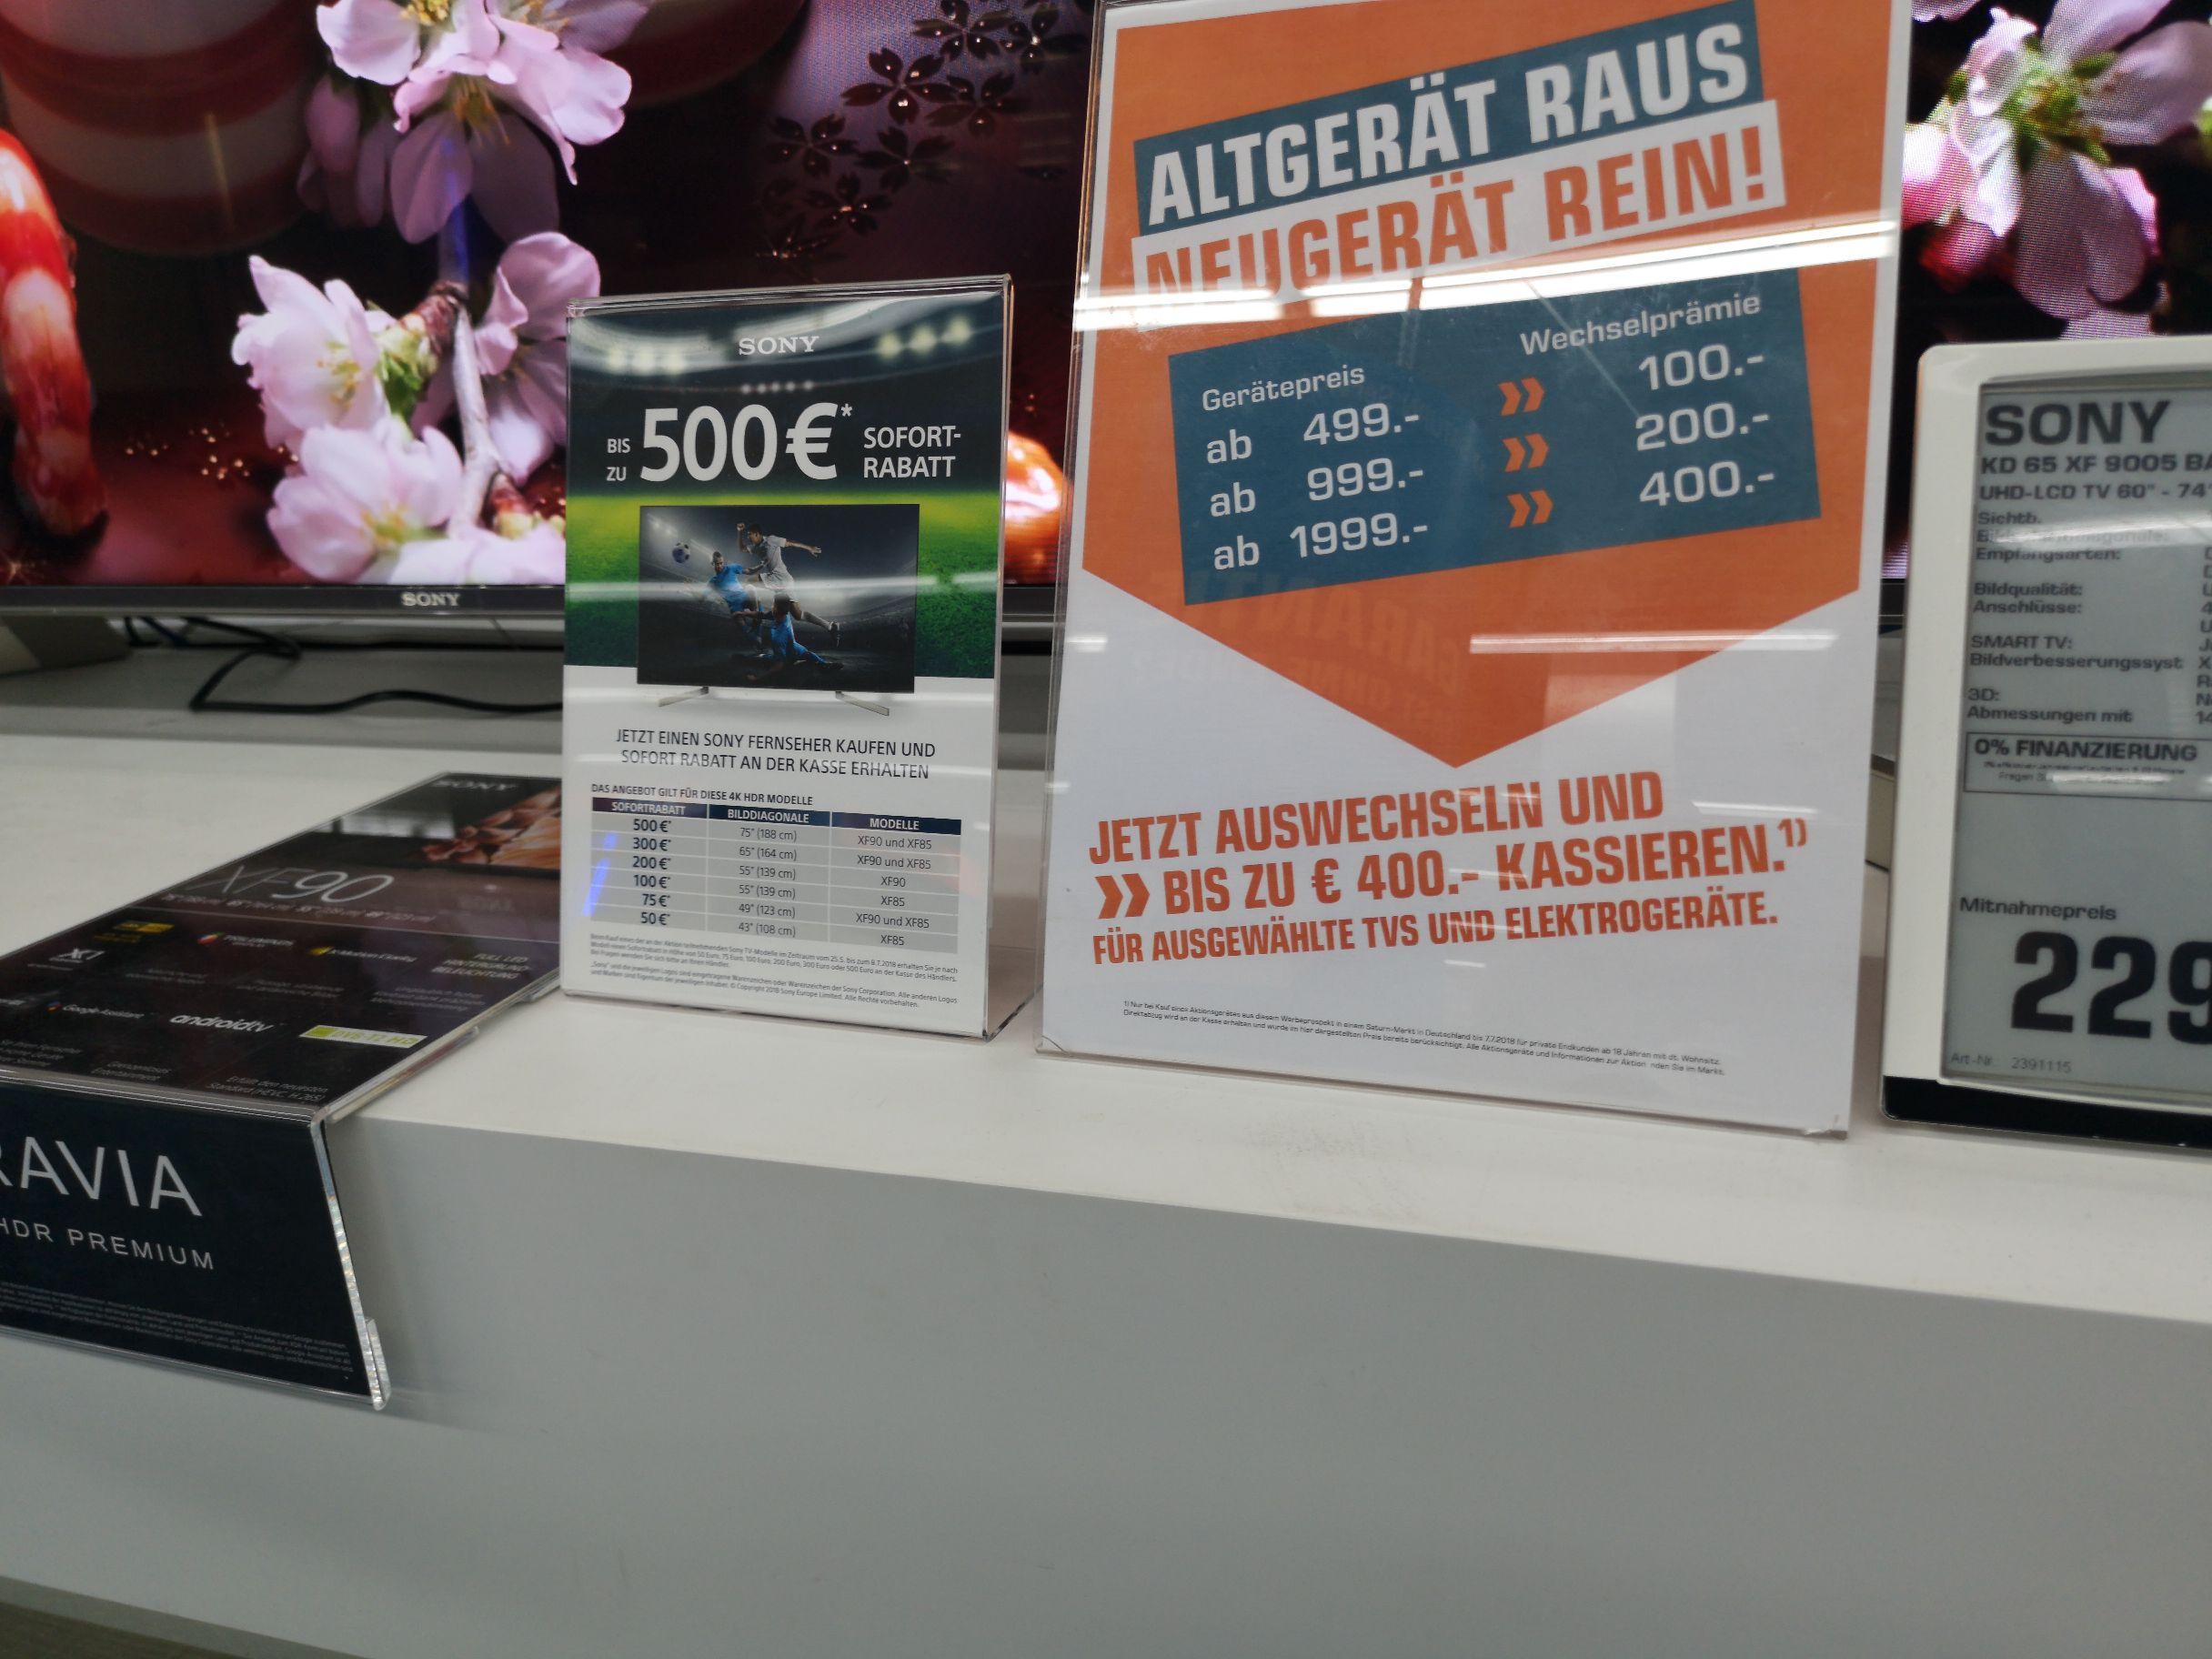 Lokal Karlsruhe Kaiserstraße: Doppelt cashback auf Sony TV